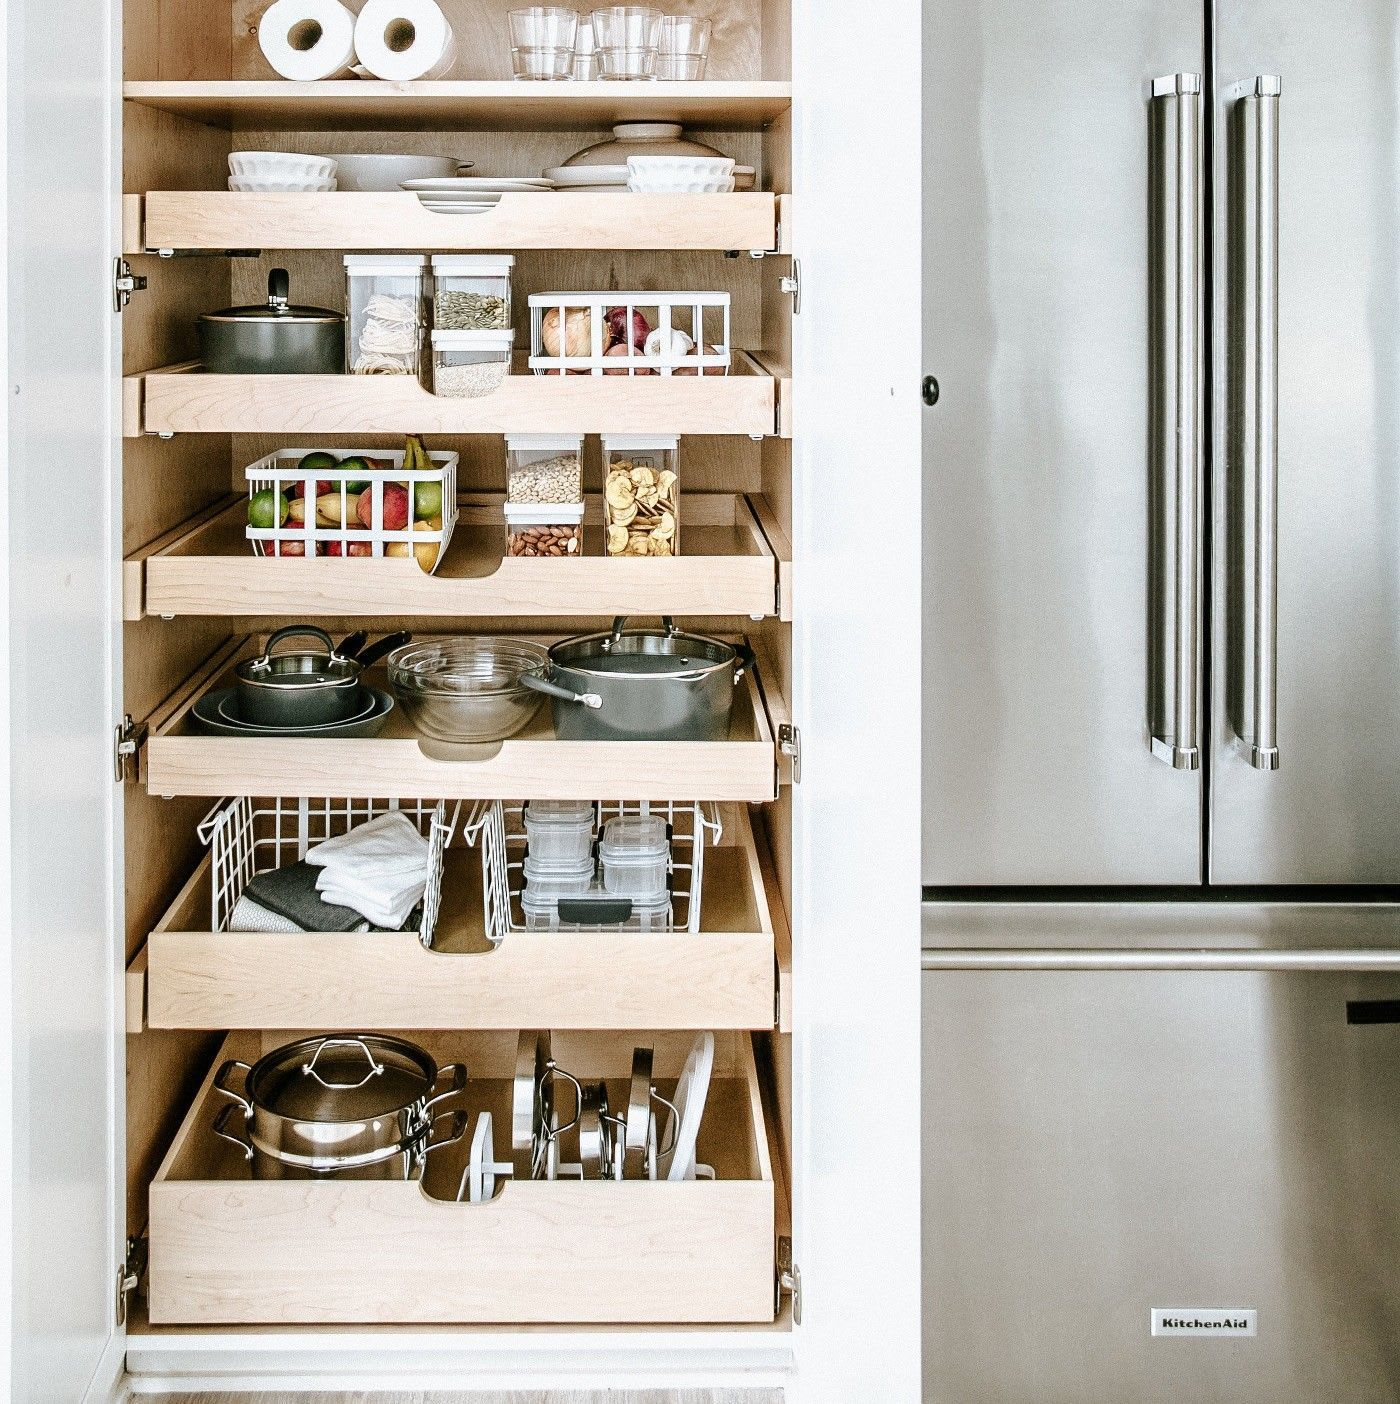 Target S Made By Design Line Keeps My Life Together Kitchen